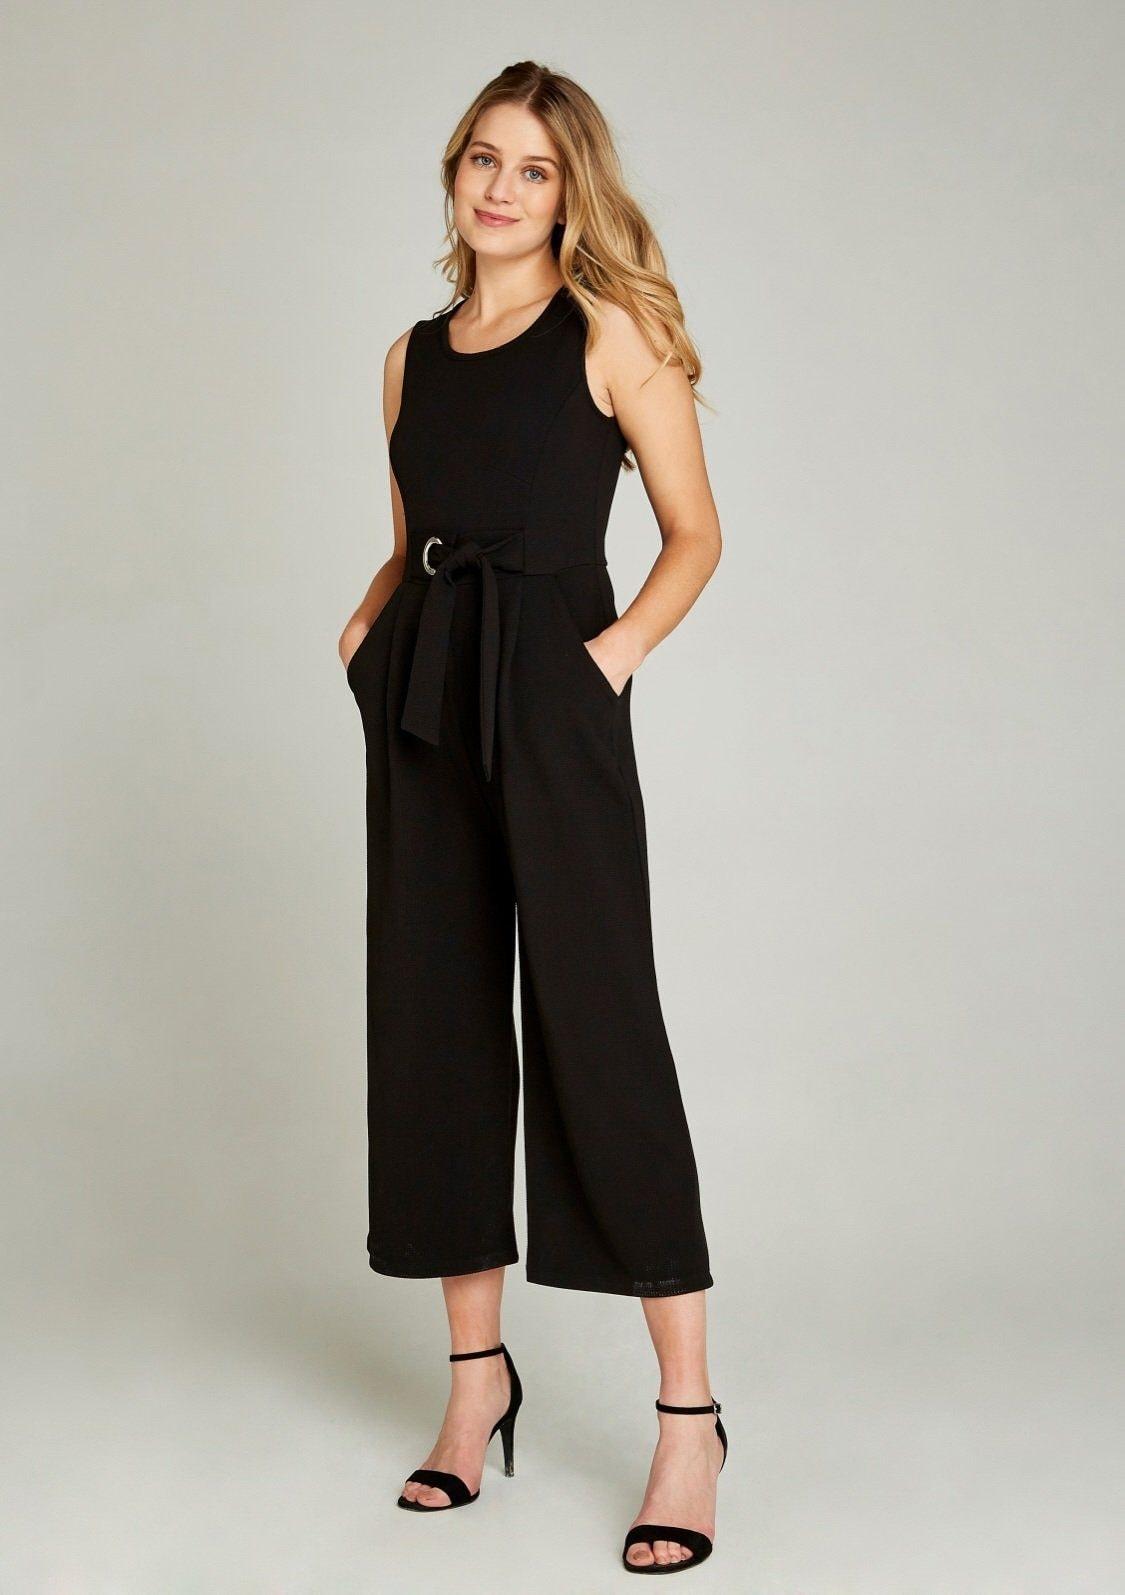 Image of Apricot Jumpsuit »Culotte Jumpsuit with Tie Waist«